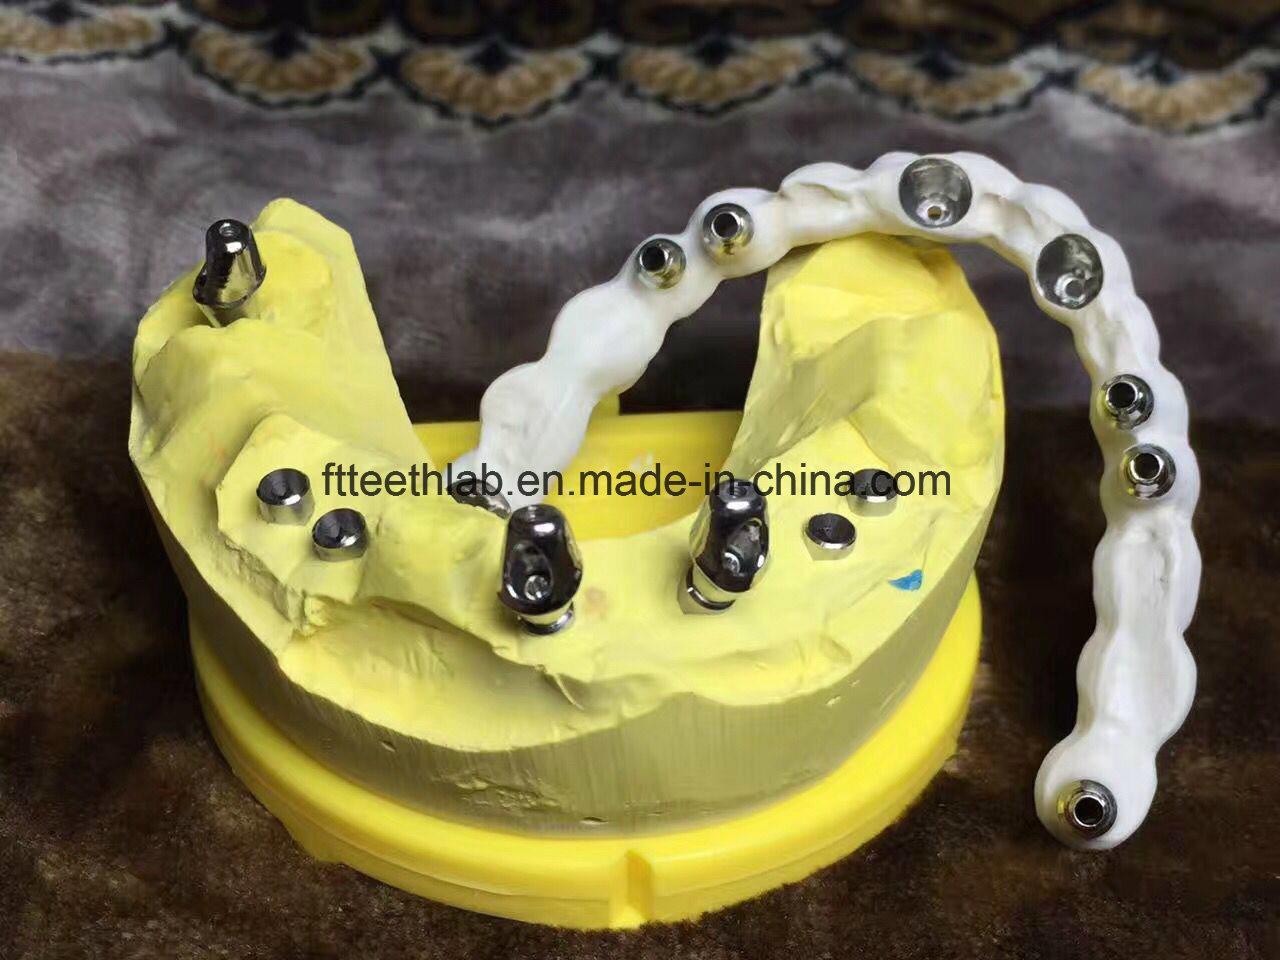 Full Arch Zirconium Implant Bridge From China Dental Lab